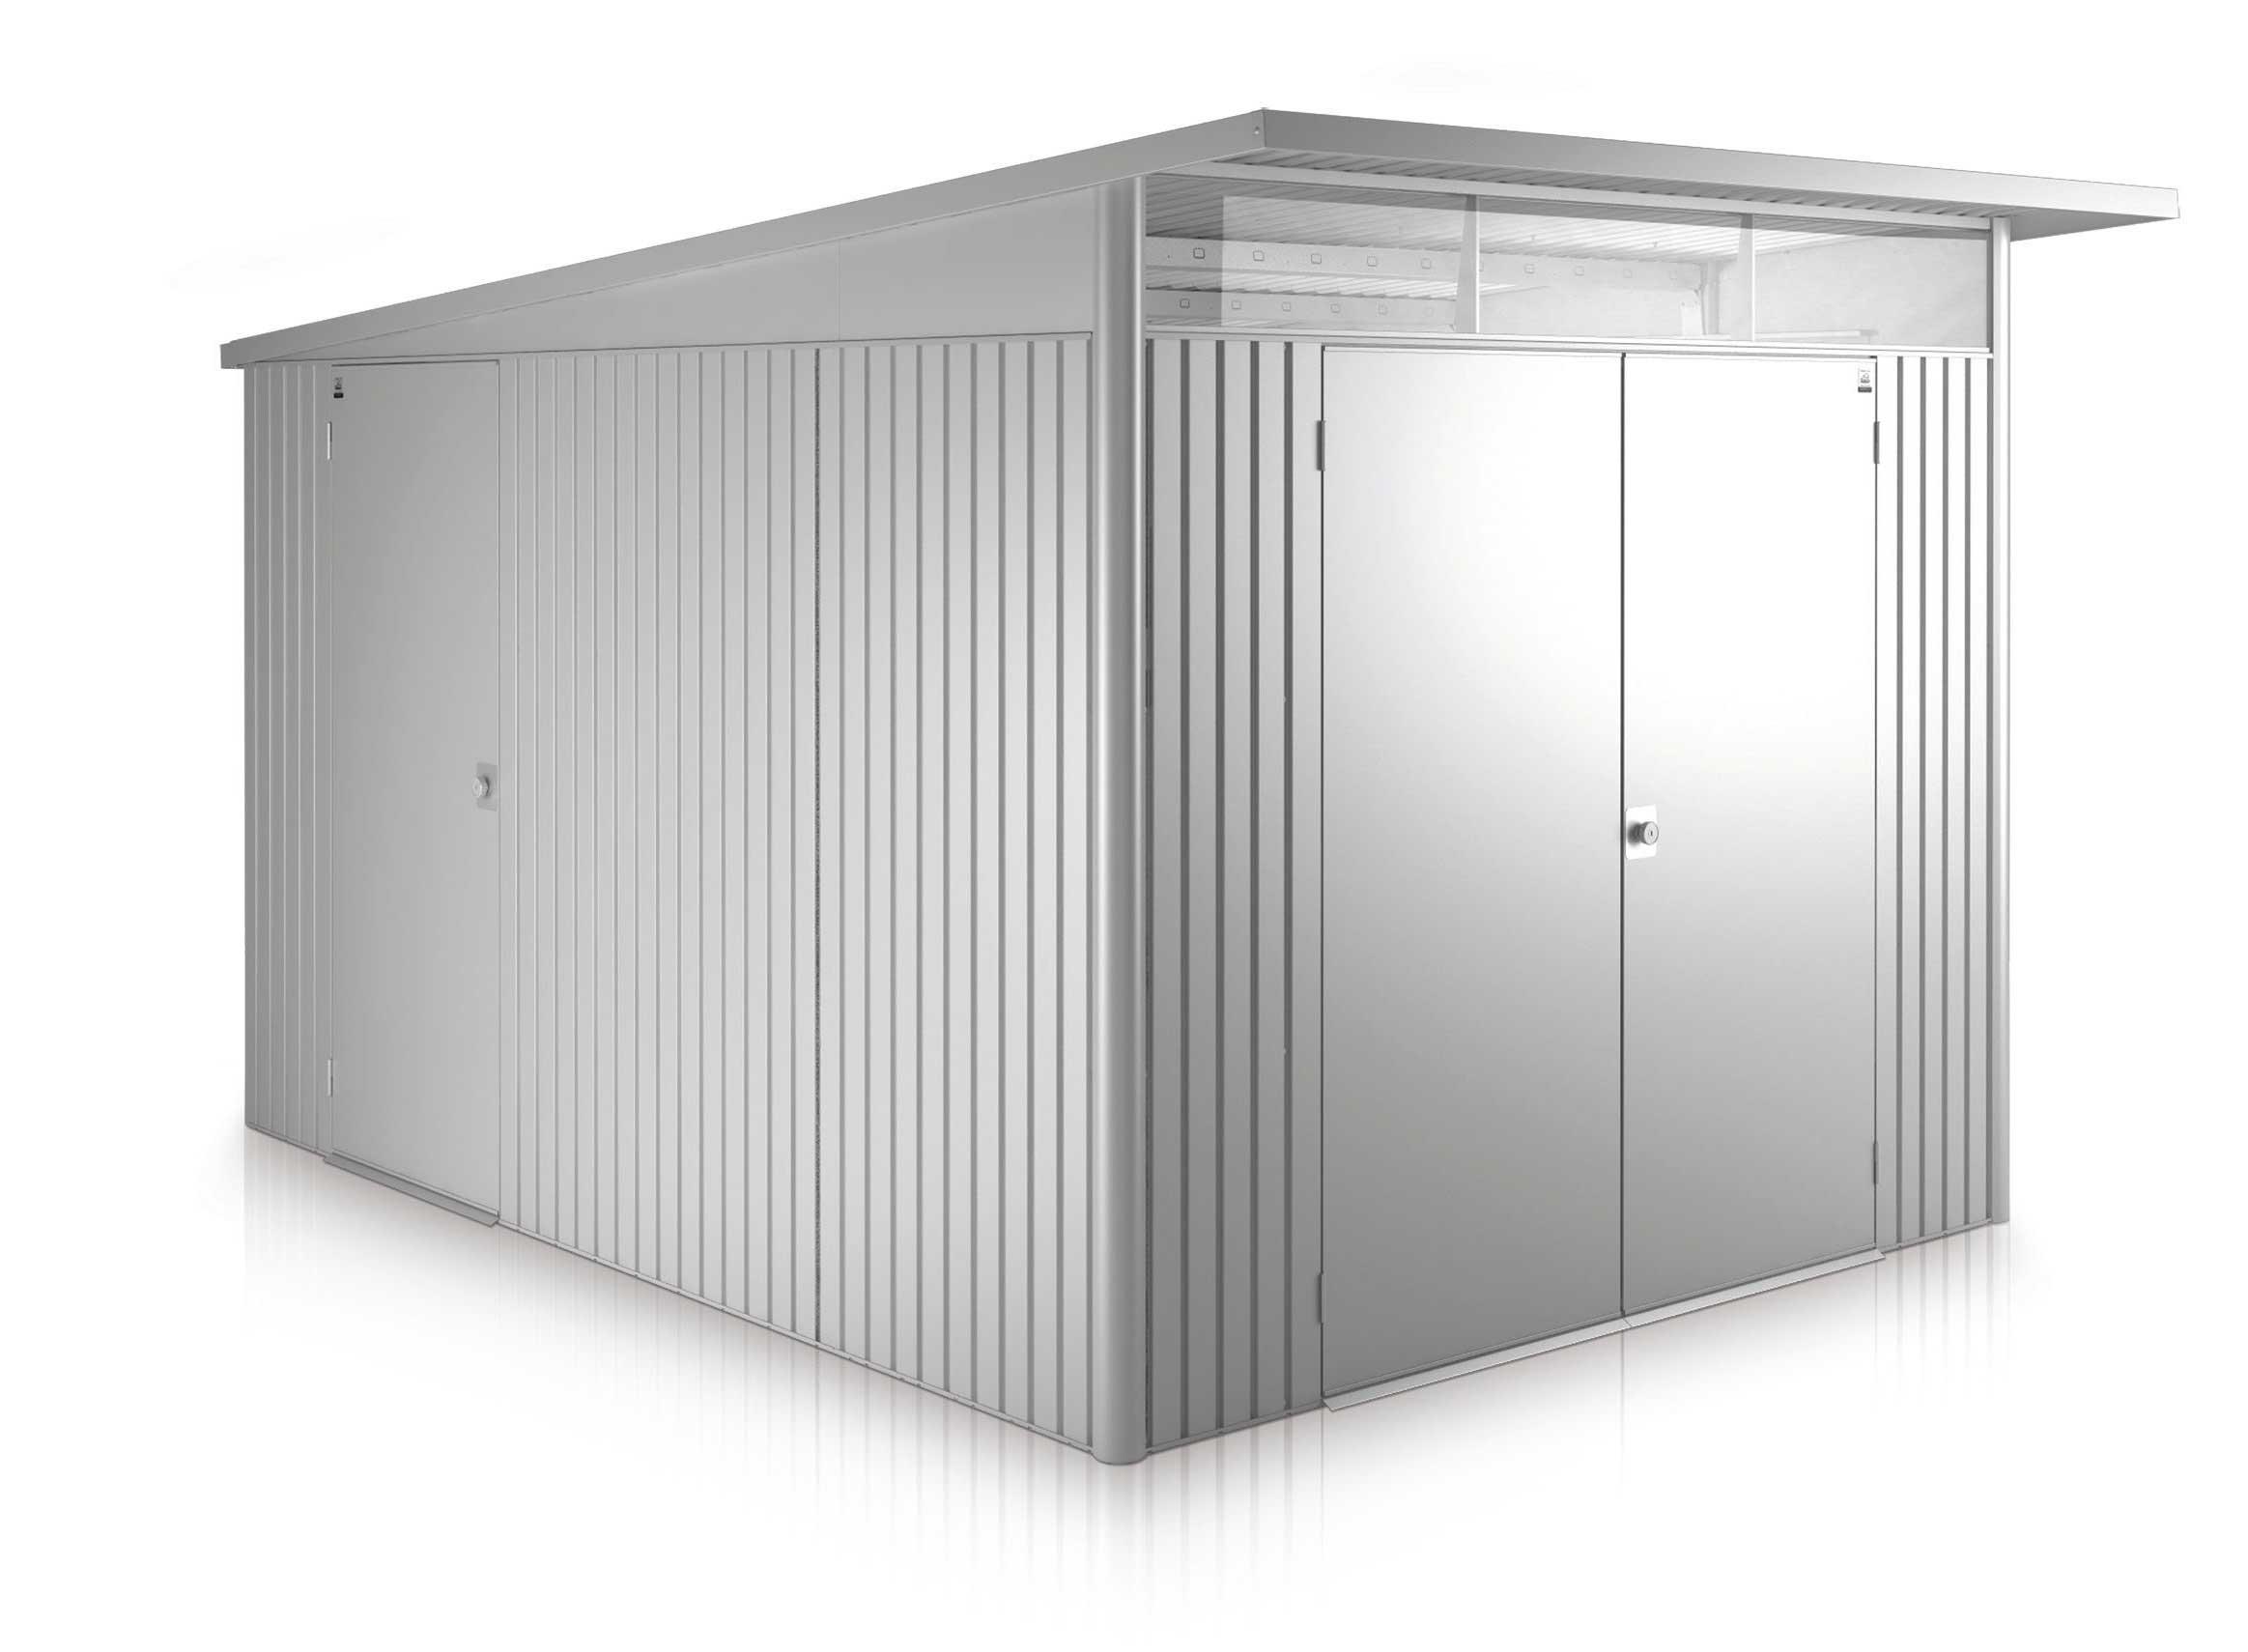 ger tehaus biohort avantgarde gr xxl silber metallic dt 260x380x222cm bei. Black Bedroom Furniture Sets. Home Design Ideas